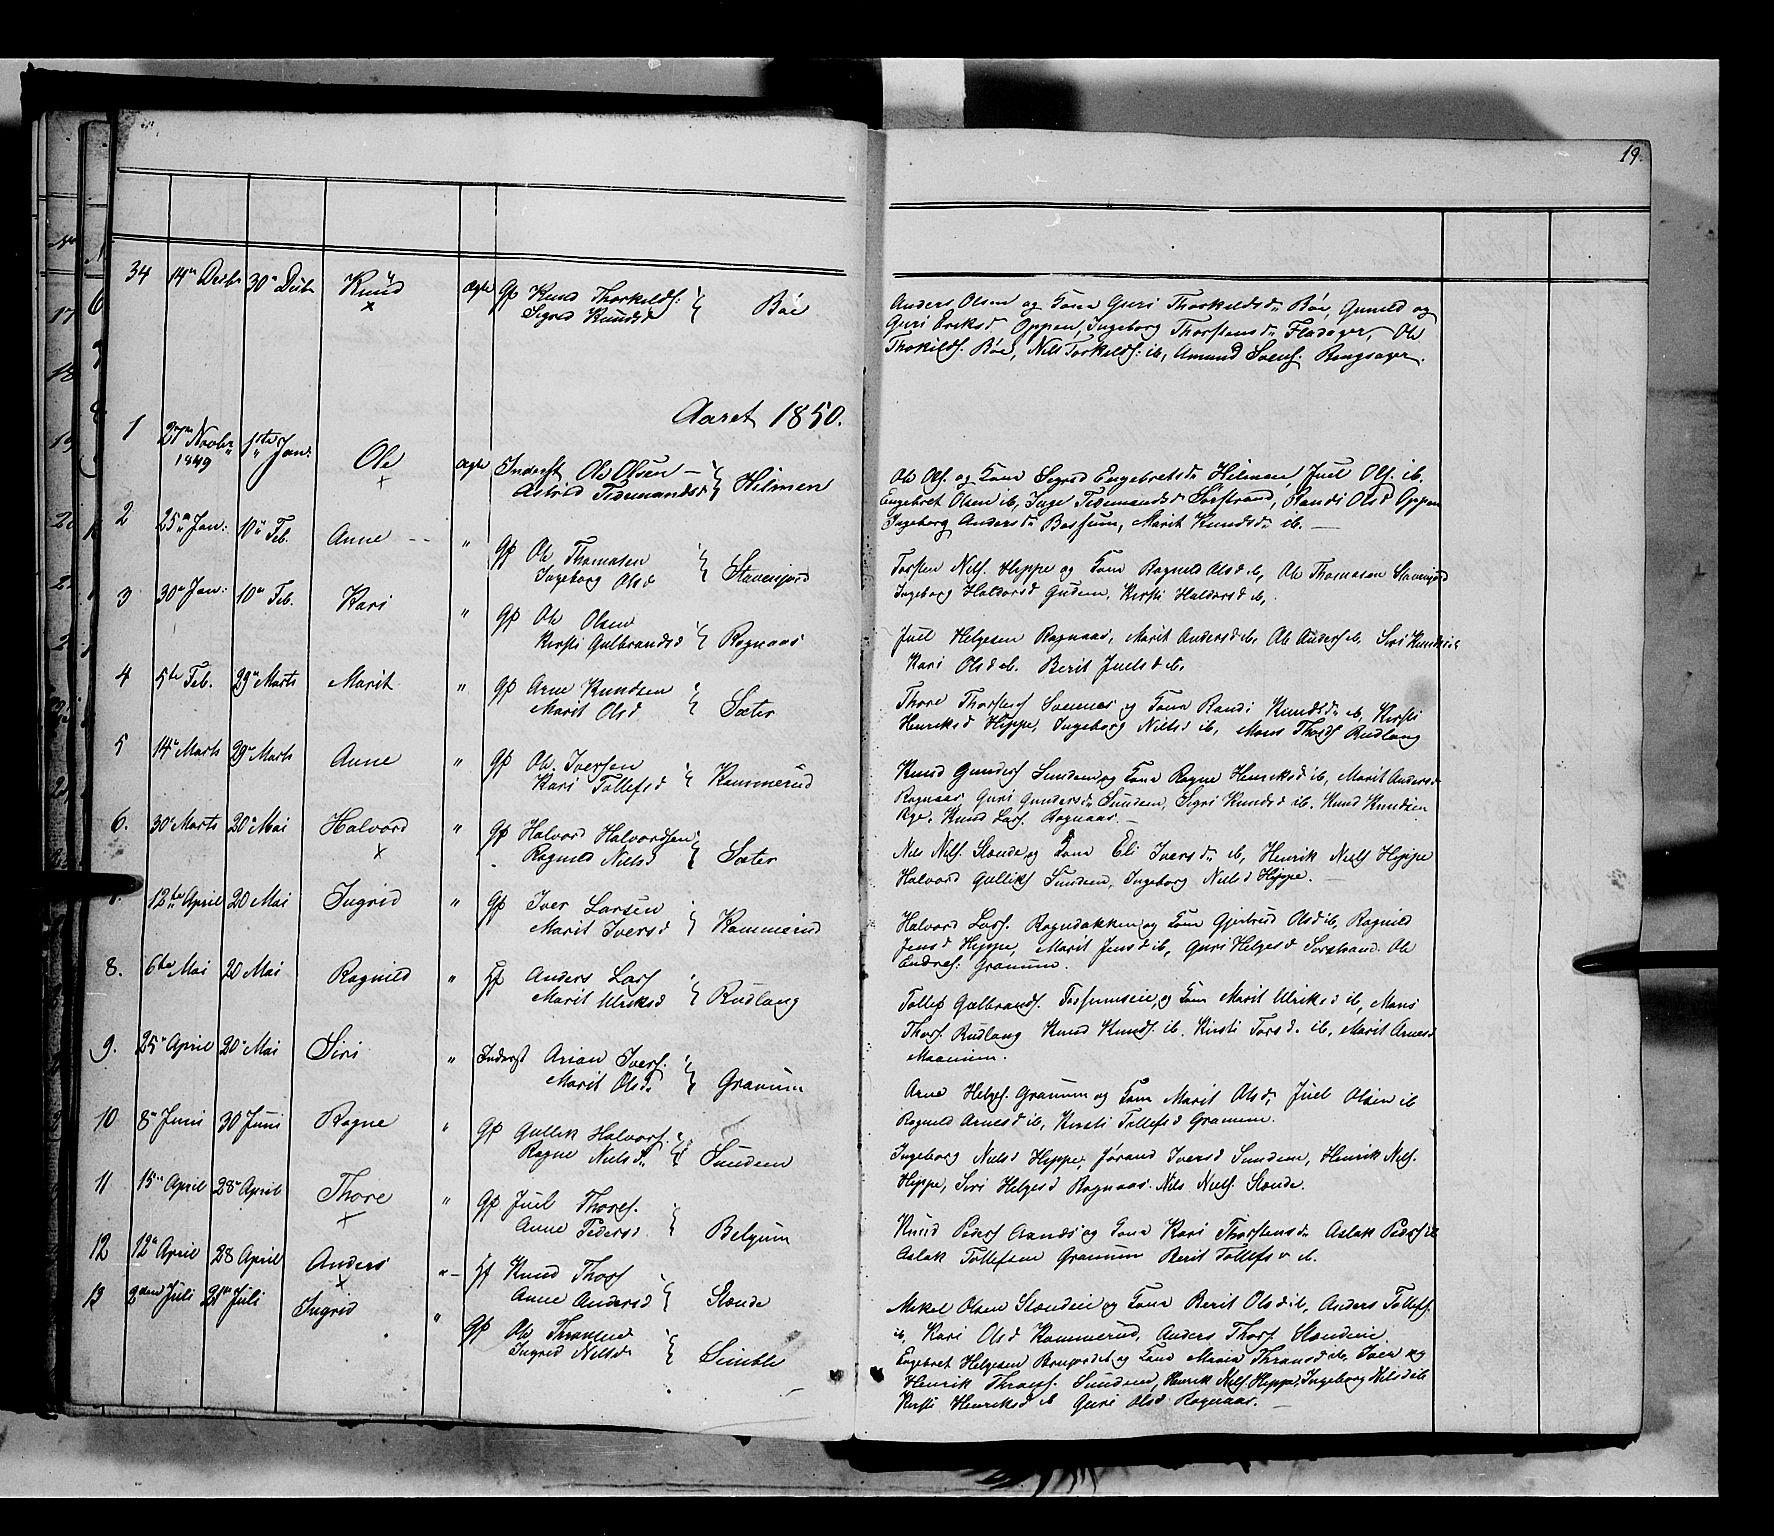 SAH, Nord-Aurdal prestekontor, Ministerialbok nr. 6, 1842-1863, s. 19